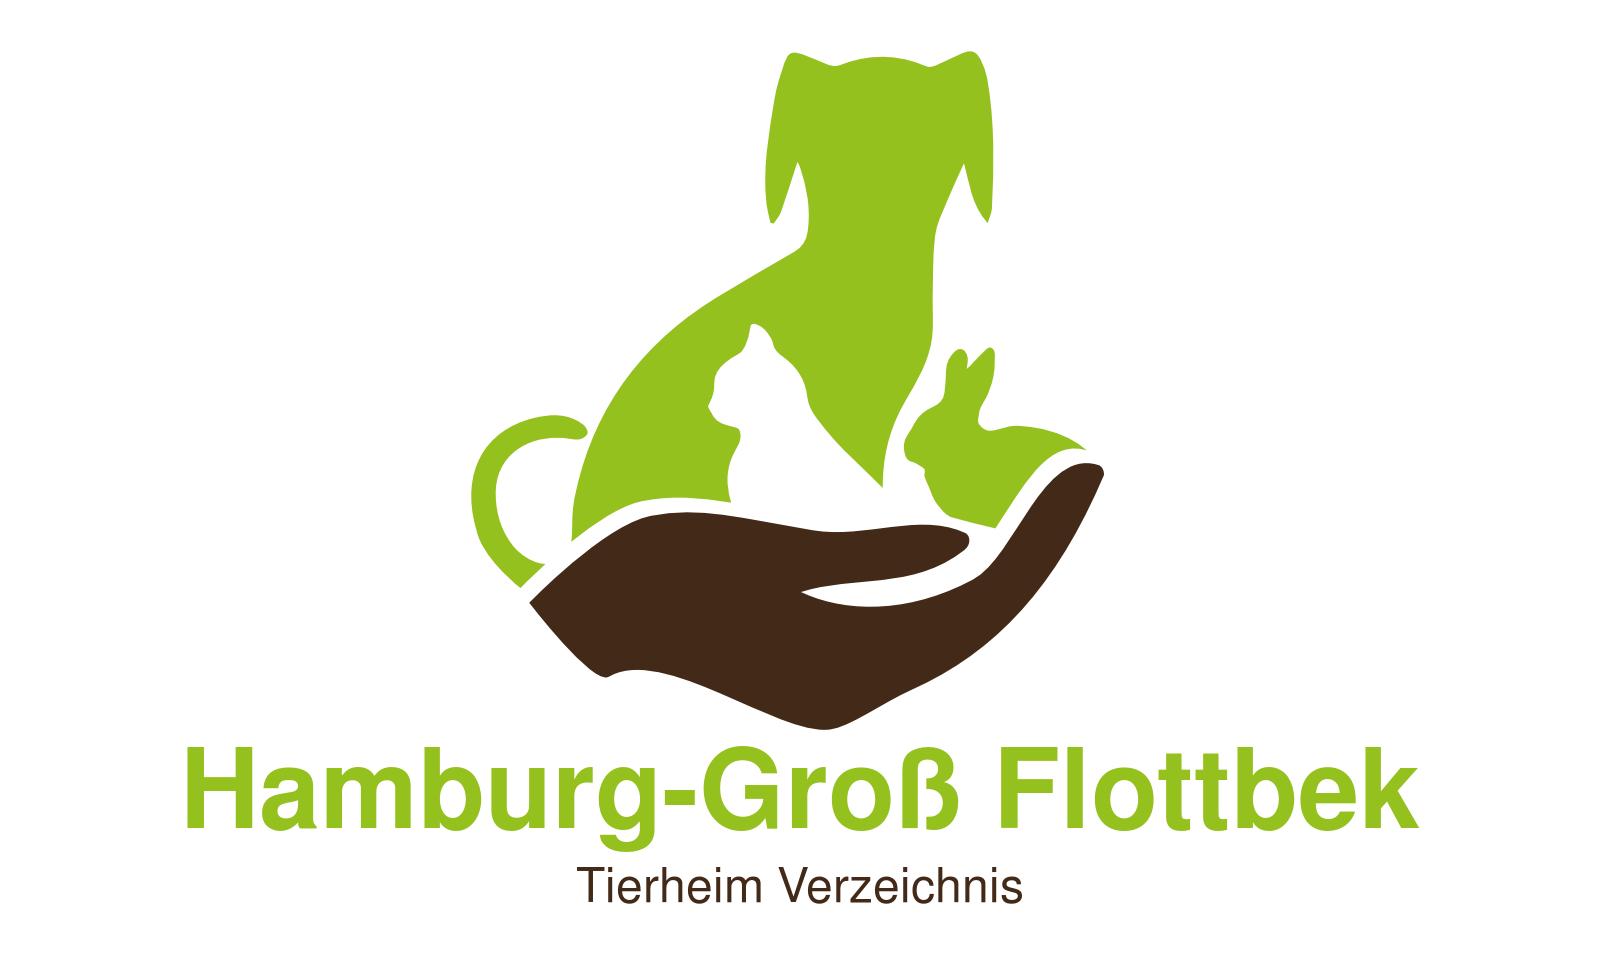 Tierheim Hamburg Groß Flottbek